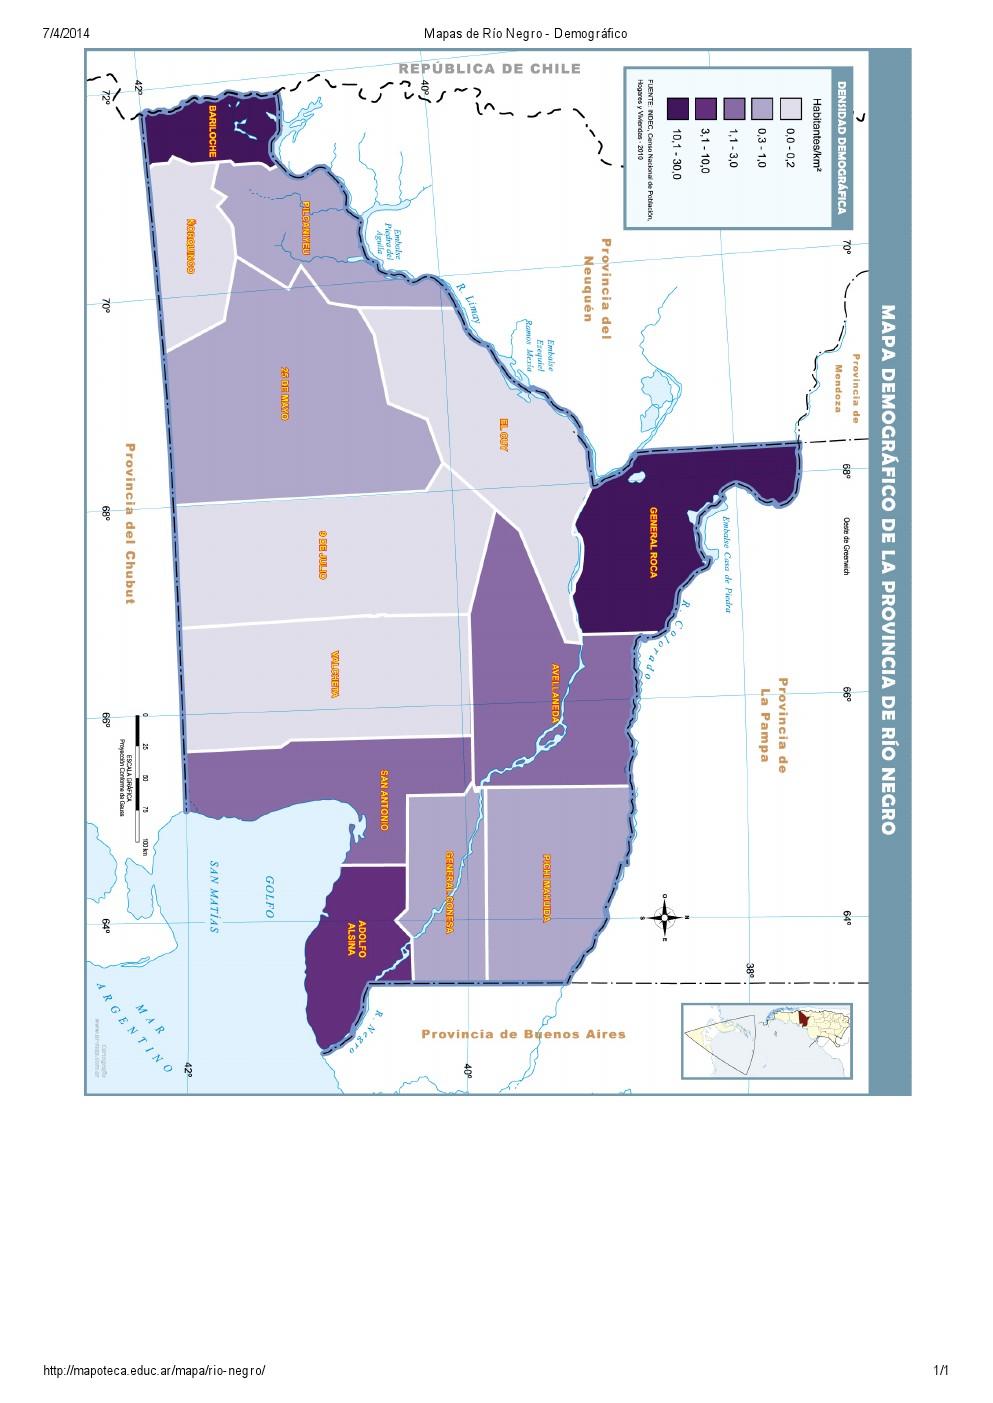 Mapa demográfico de Río Negro. Mapoteca de Educ.ar